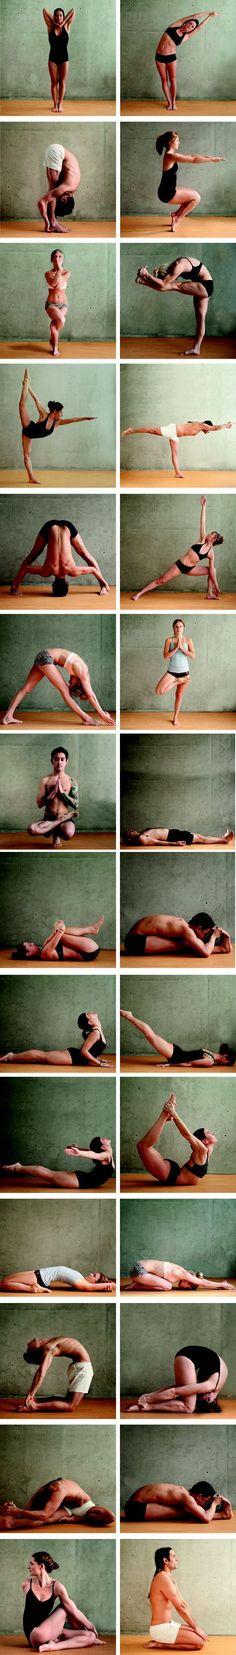 nice 26 Bikram Yoga Poses  #yoga #fitness  |  bikramyogavancouv......                                                                                                                                                                                 More